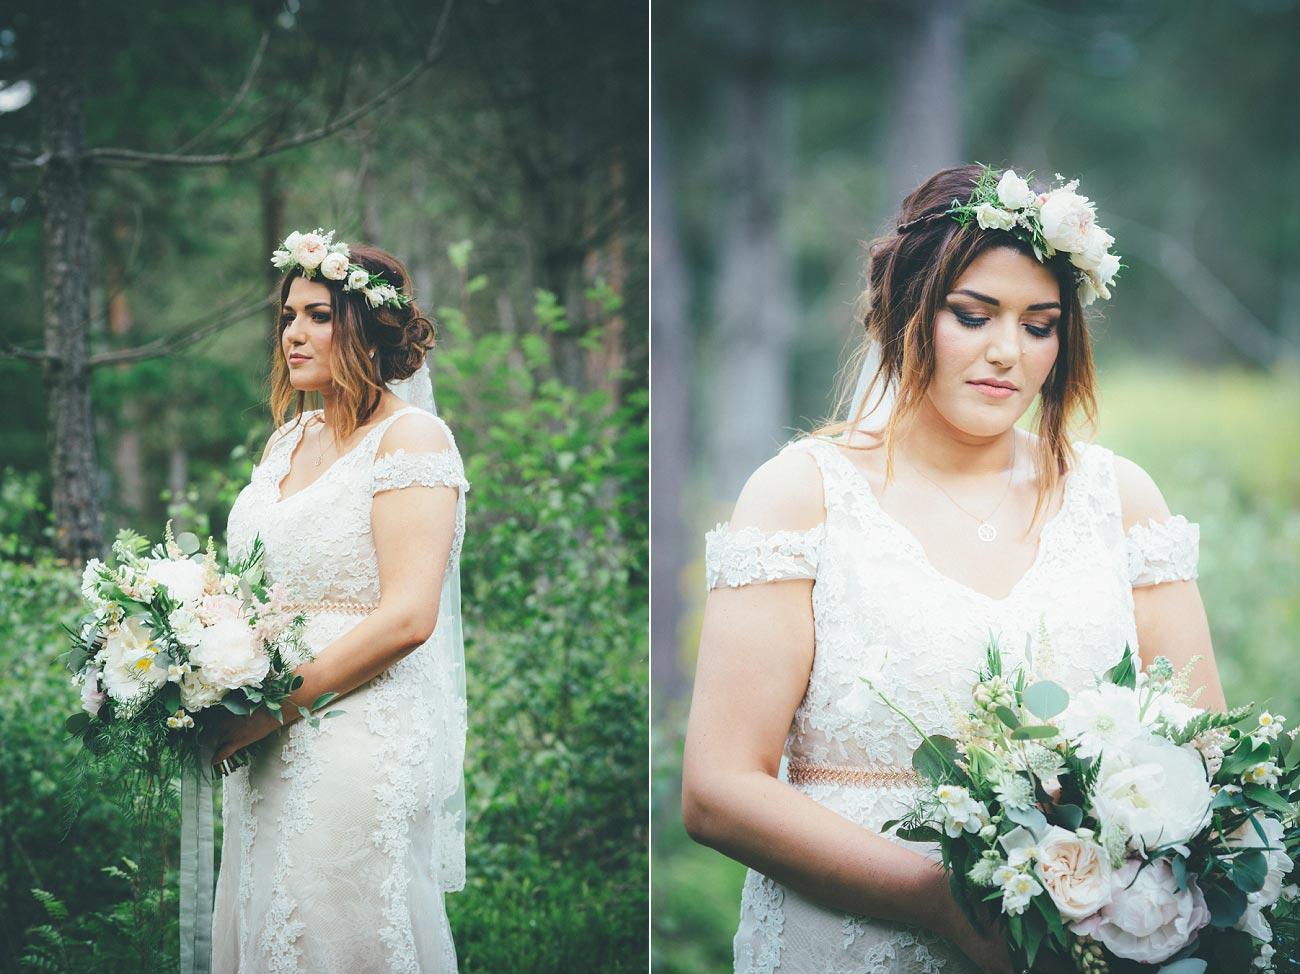 wedding photography fife letham village Hall scotland woodland vintage 0081